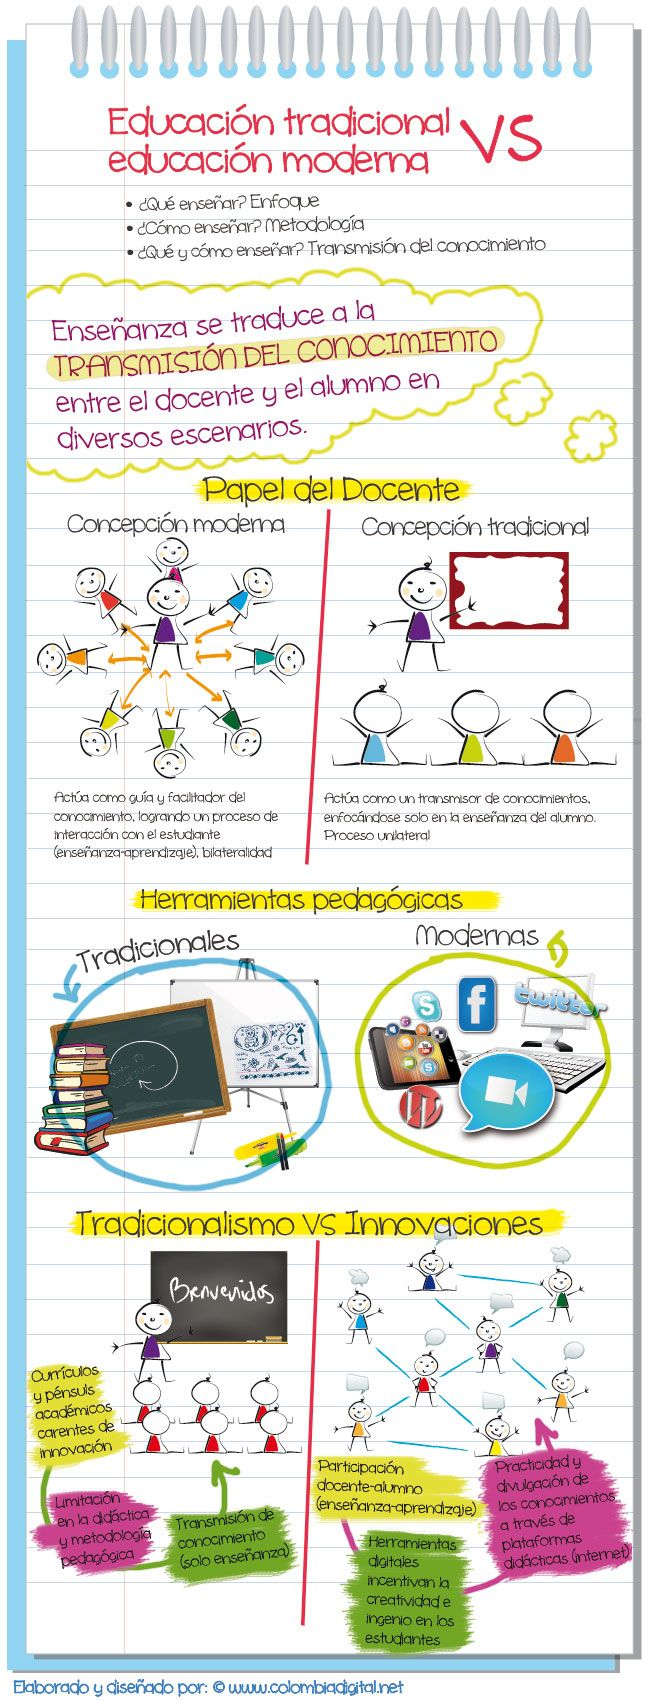 EducTradicionalVsEducModernaVisiónGeneral-Infografía-BlogGesvin